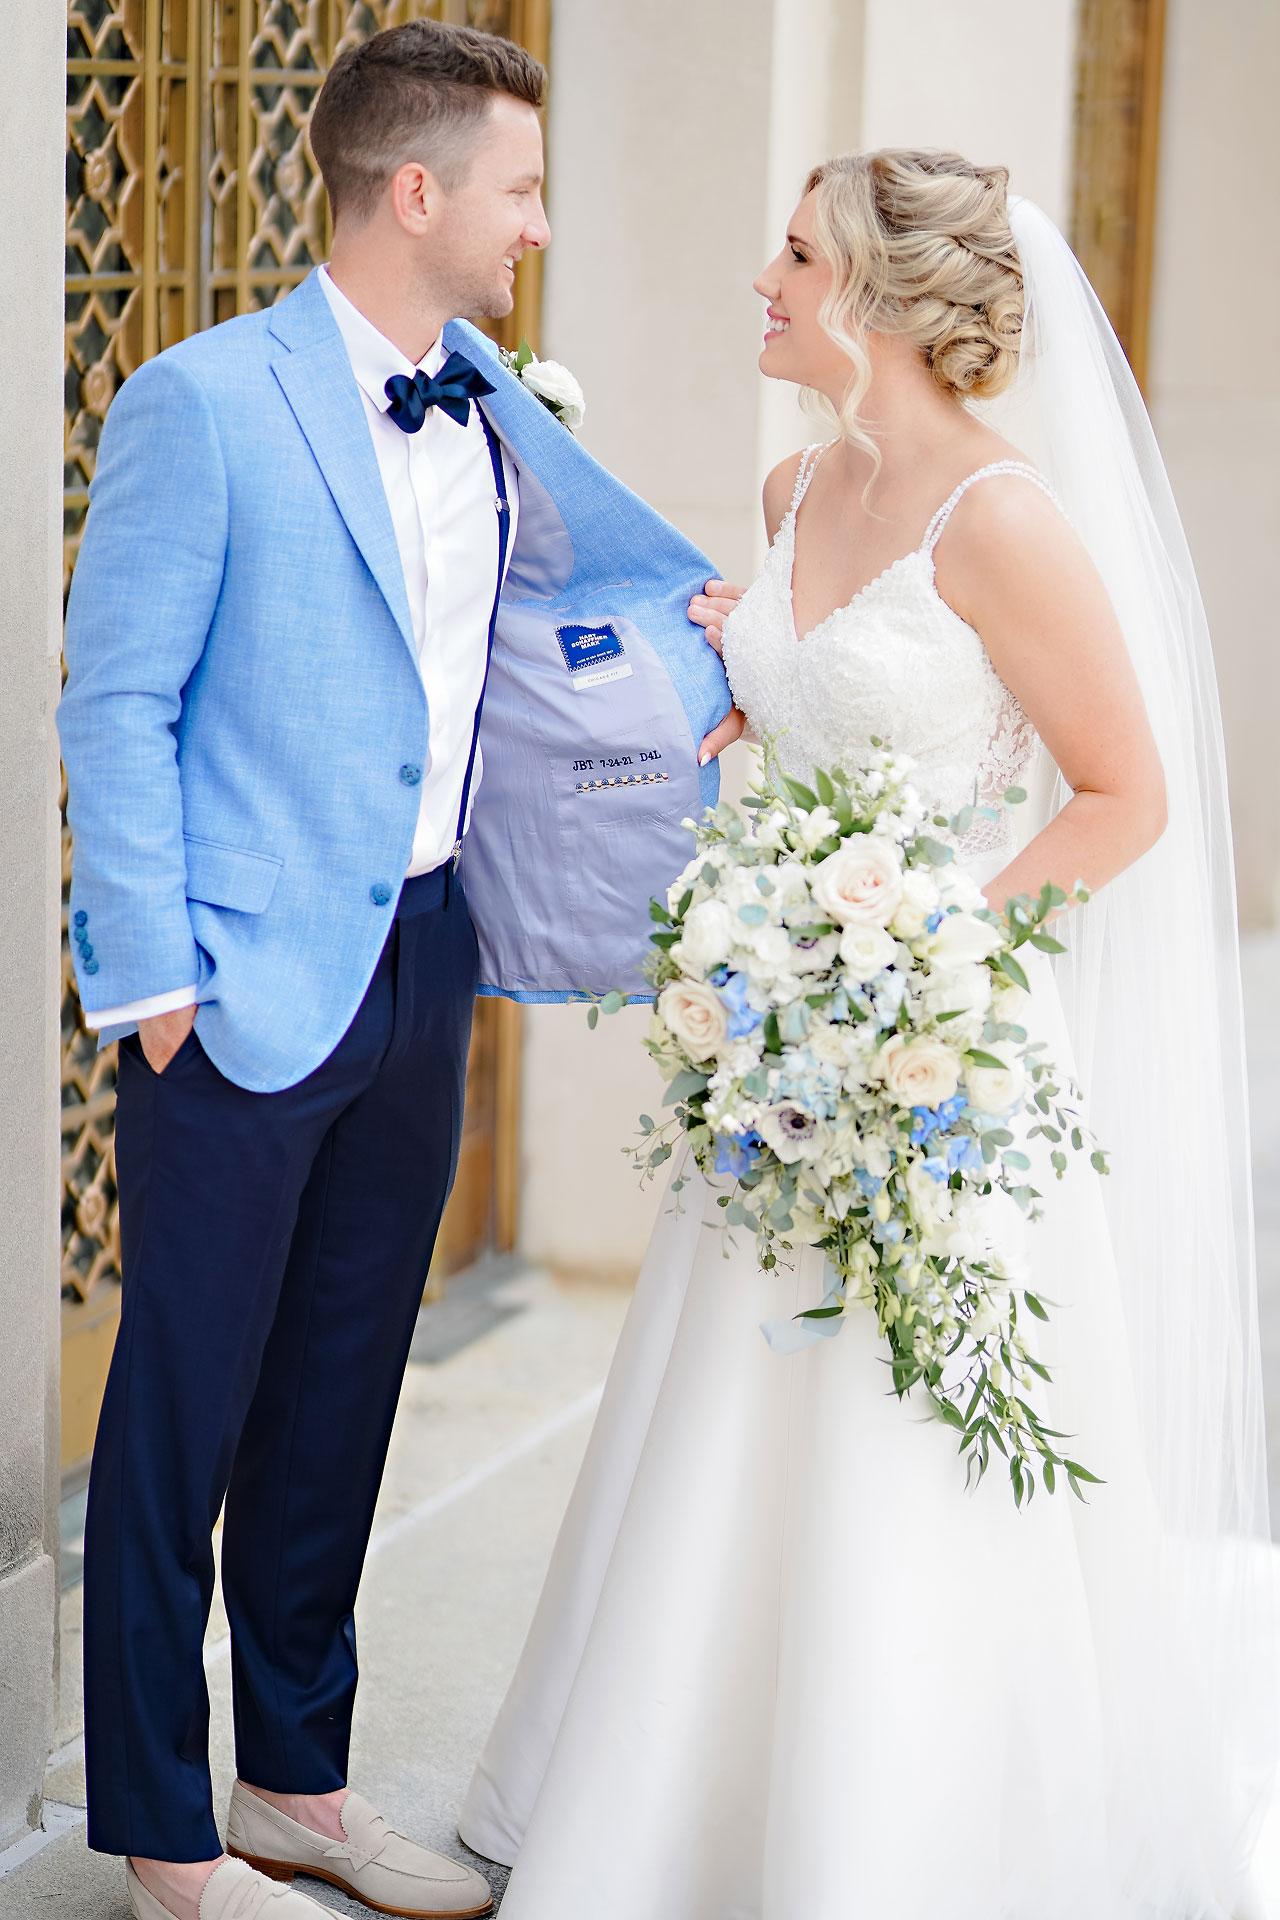 Sammi Jack Regions Tower JPS Events Indianapolis Wedding 114